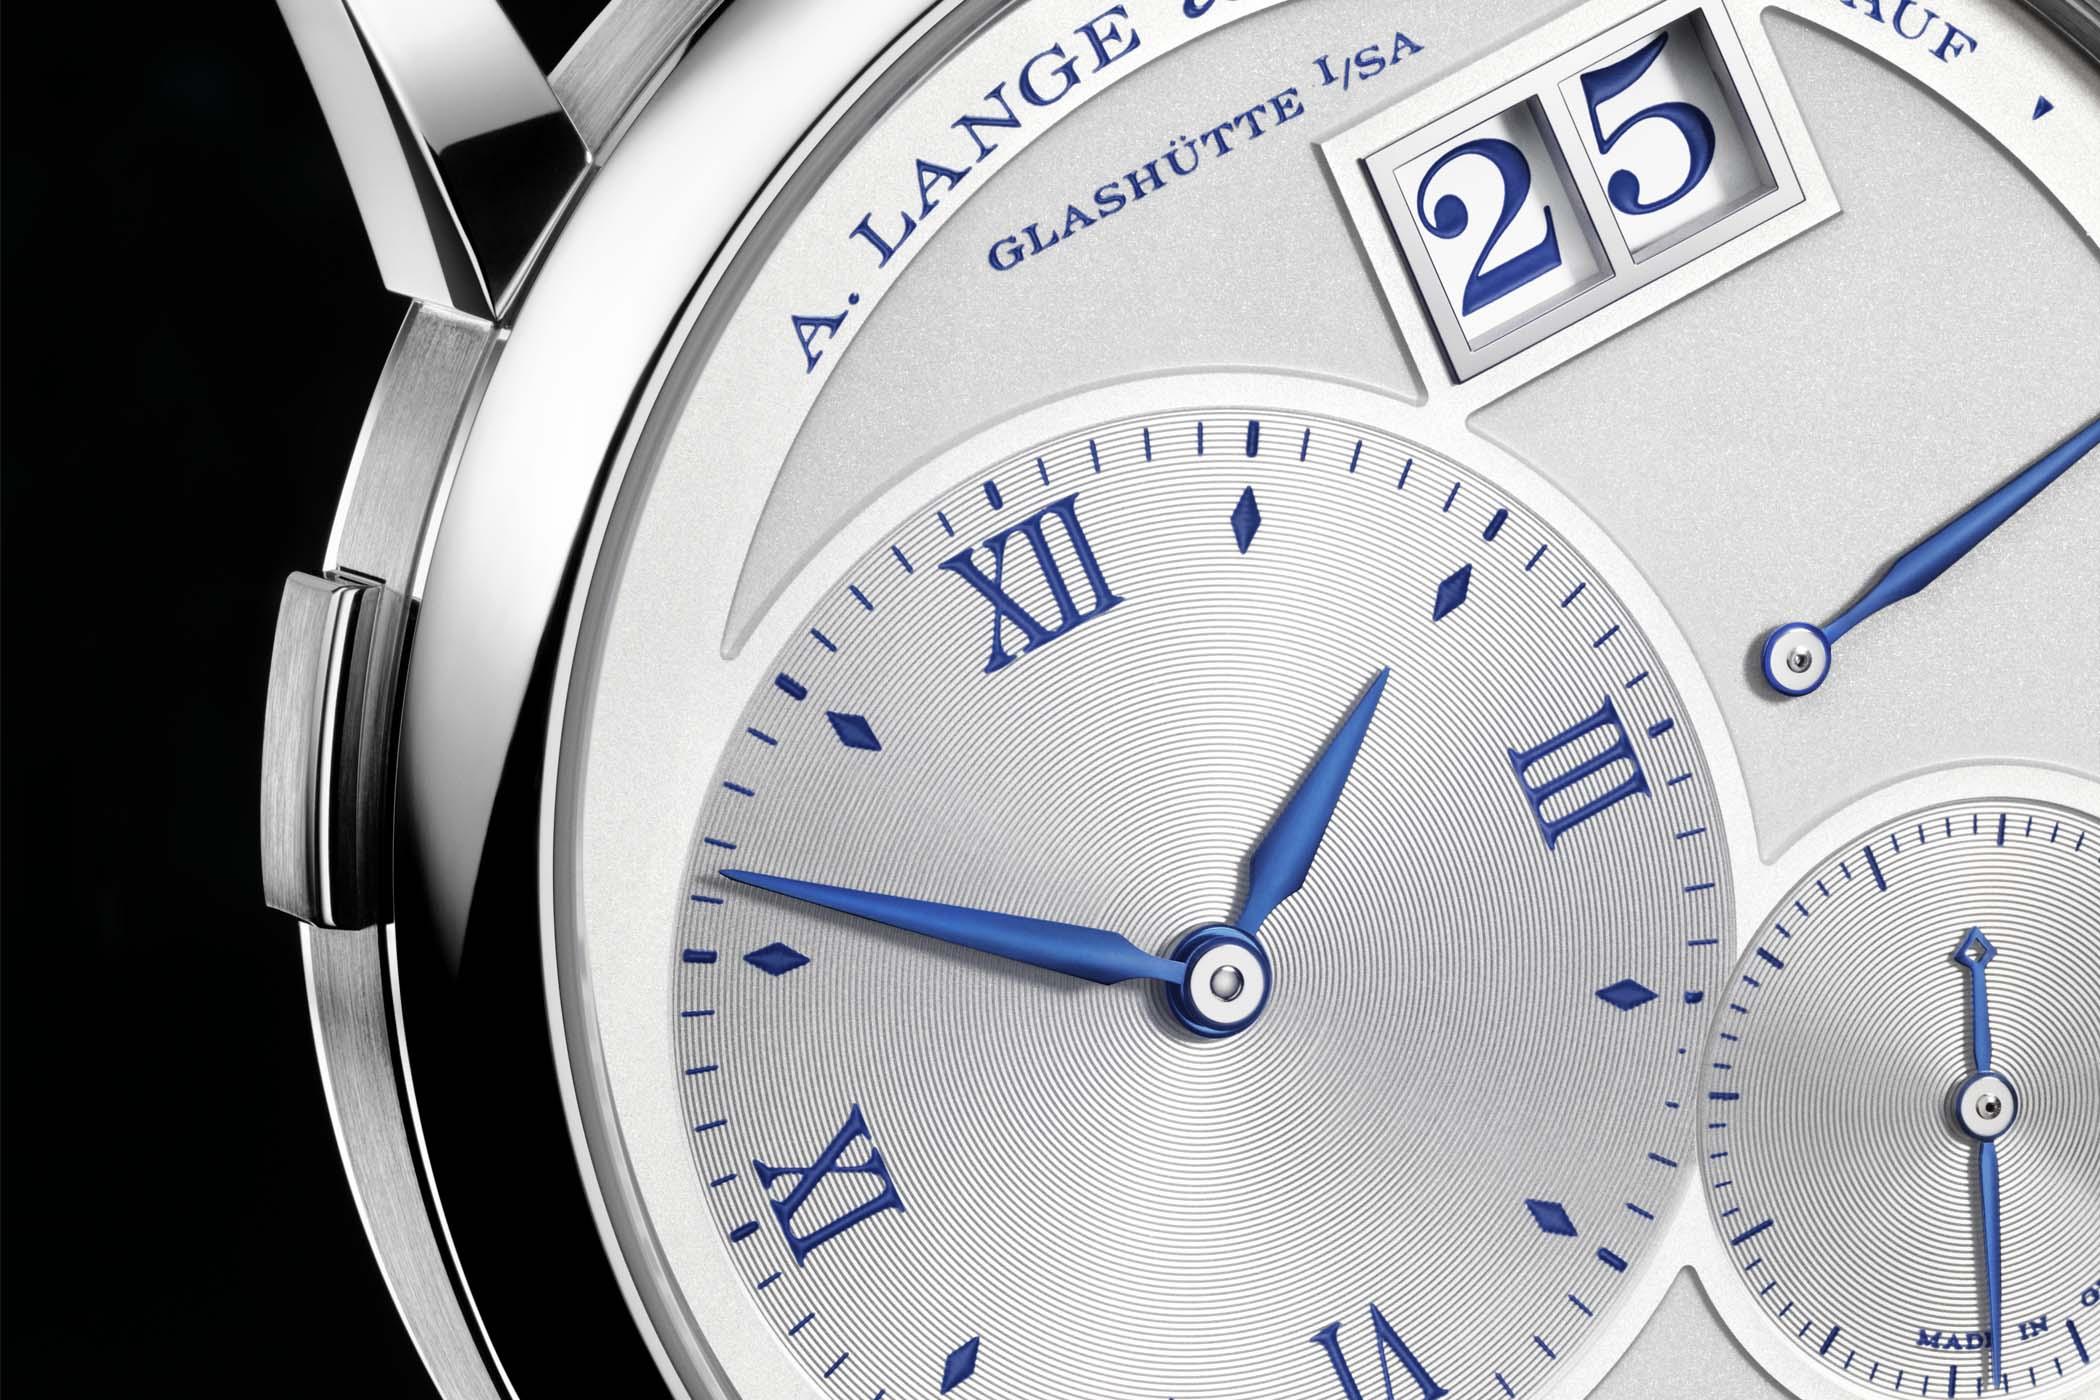 Grand Lange 1 25th Anniversary A. Lange Sohne - 117.066